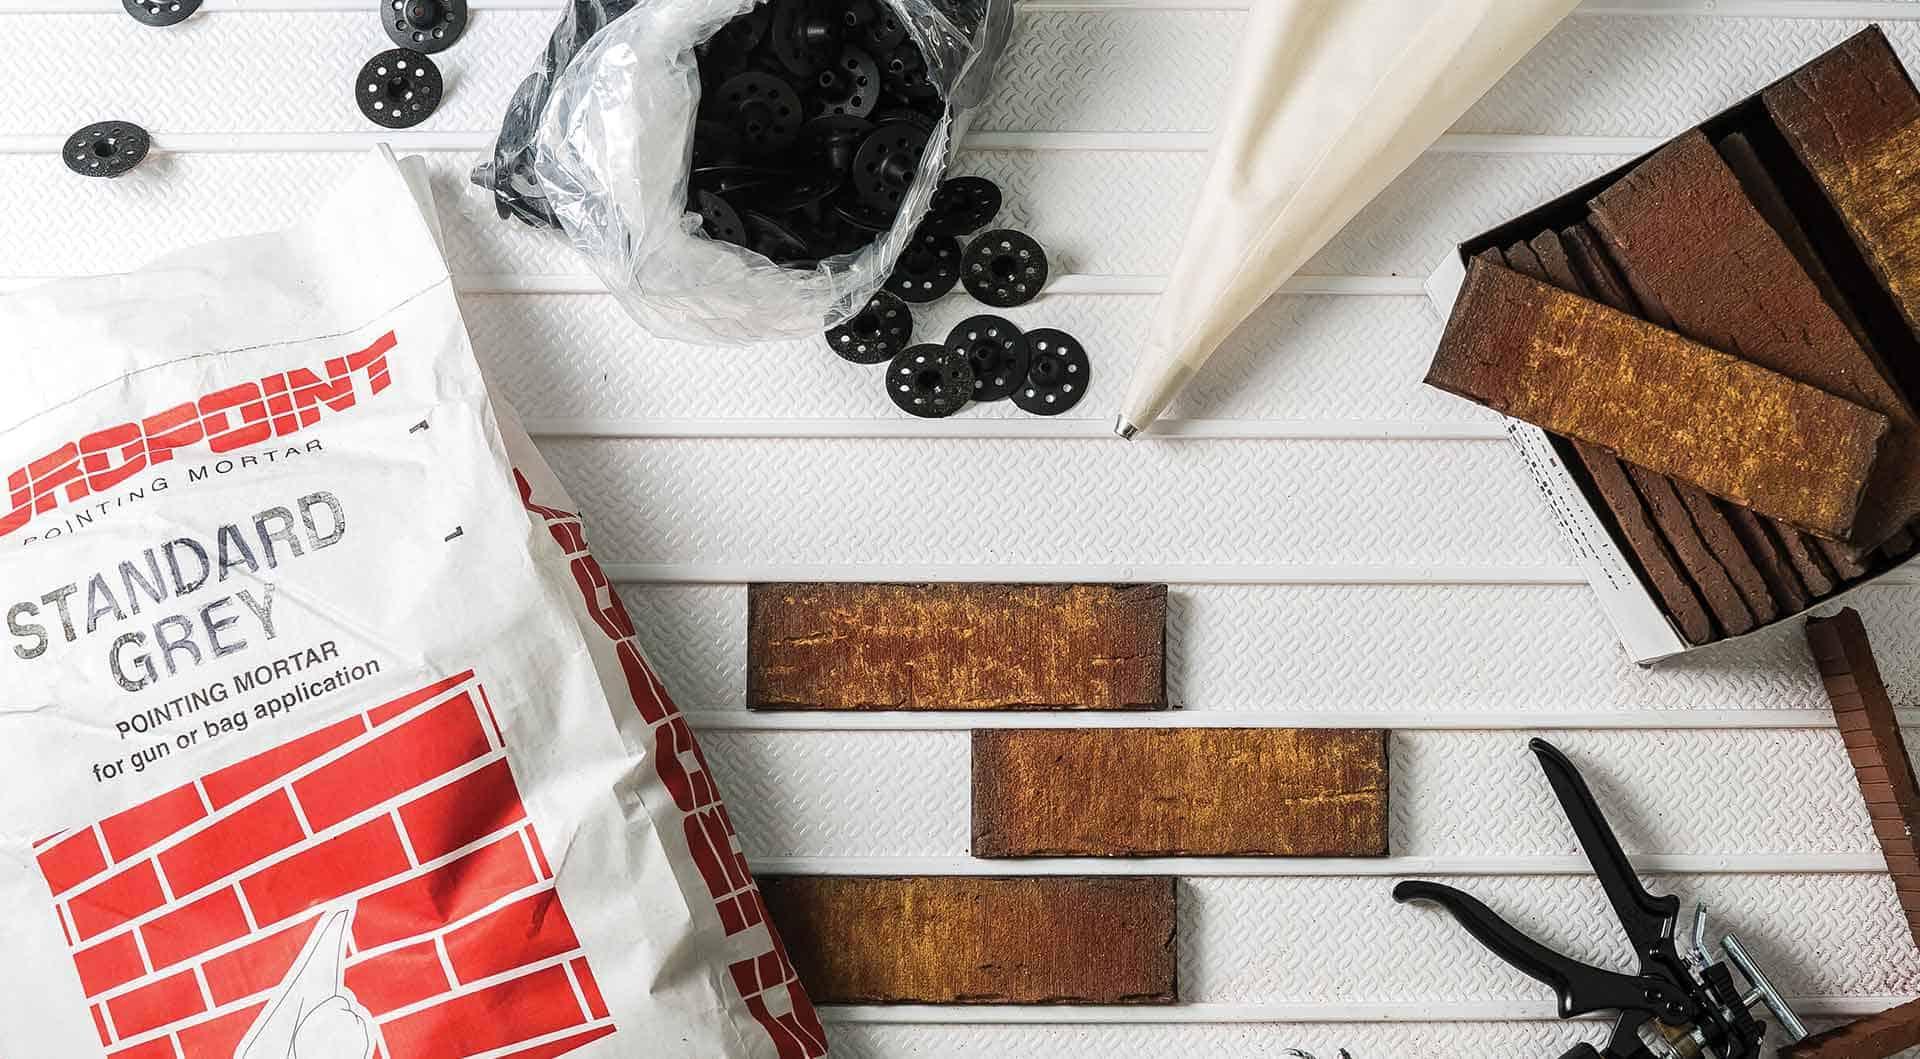 Brick Slip accessories and Cladding accessories